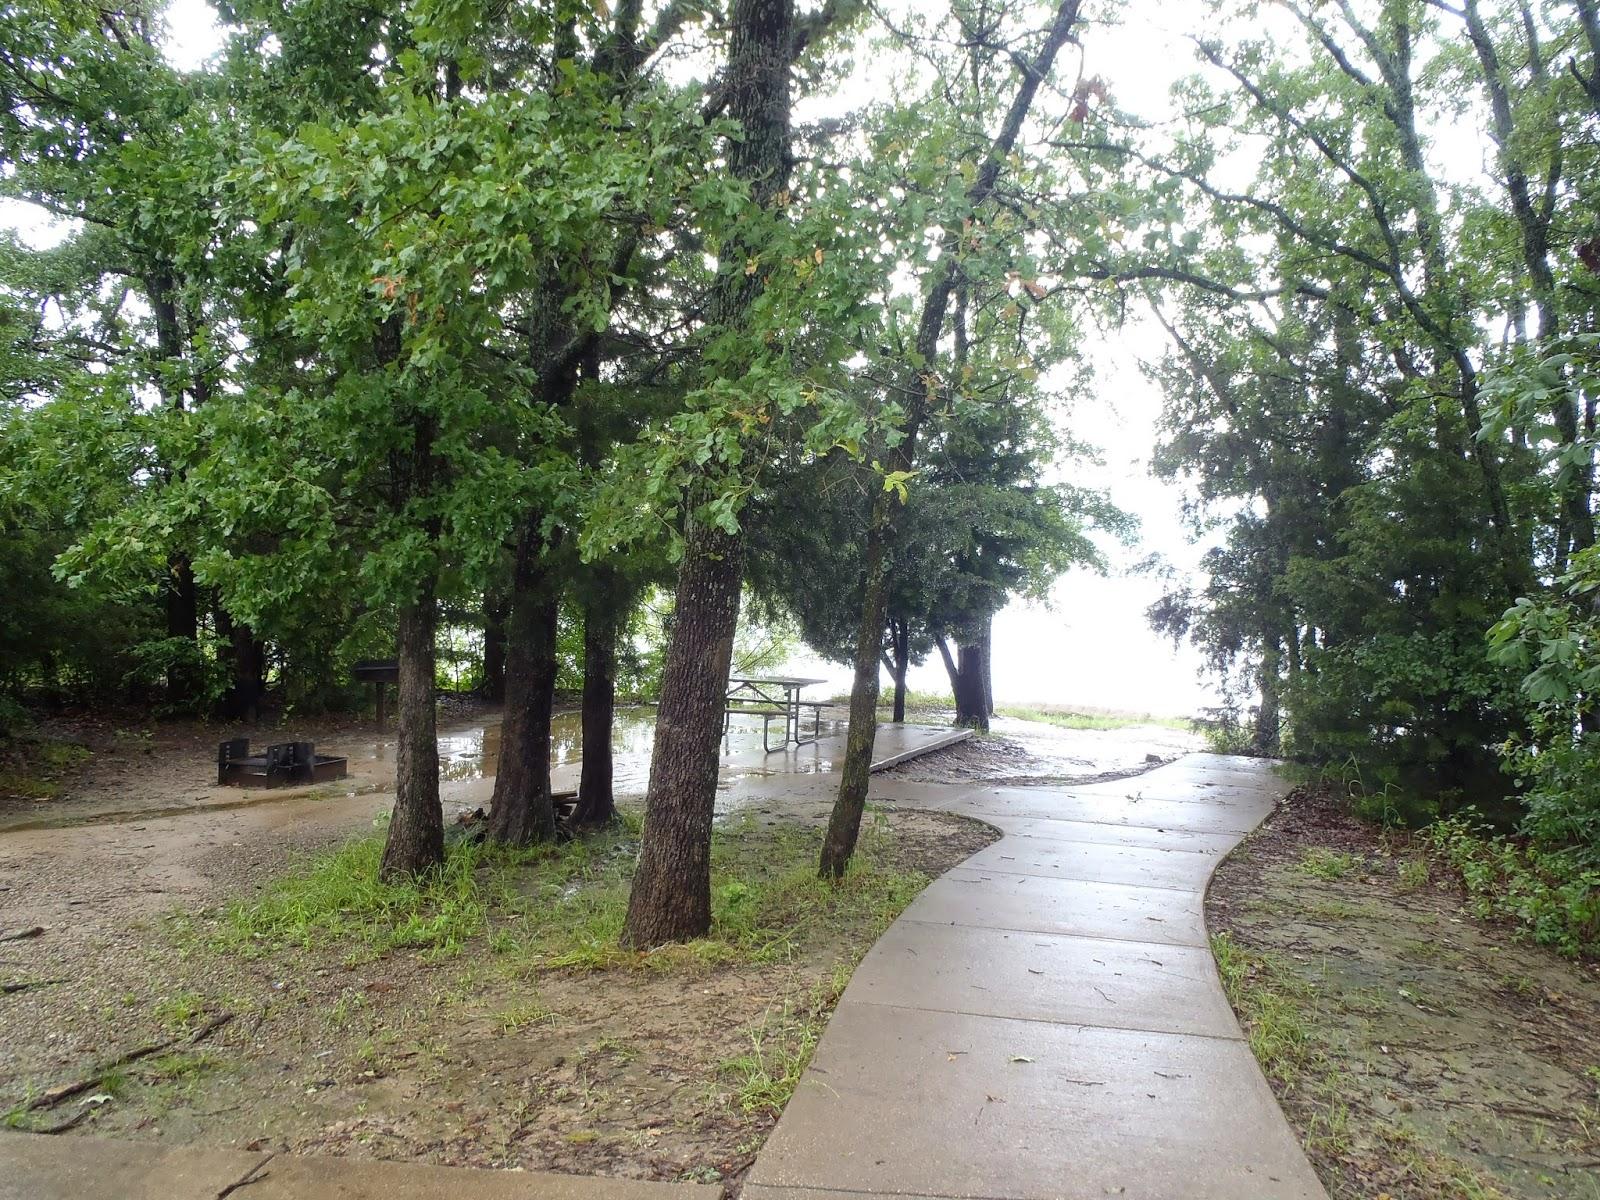 Adult hookup in west tawakoni texas